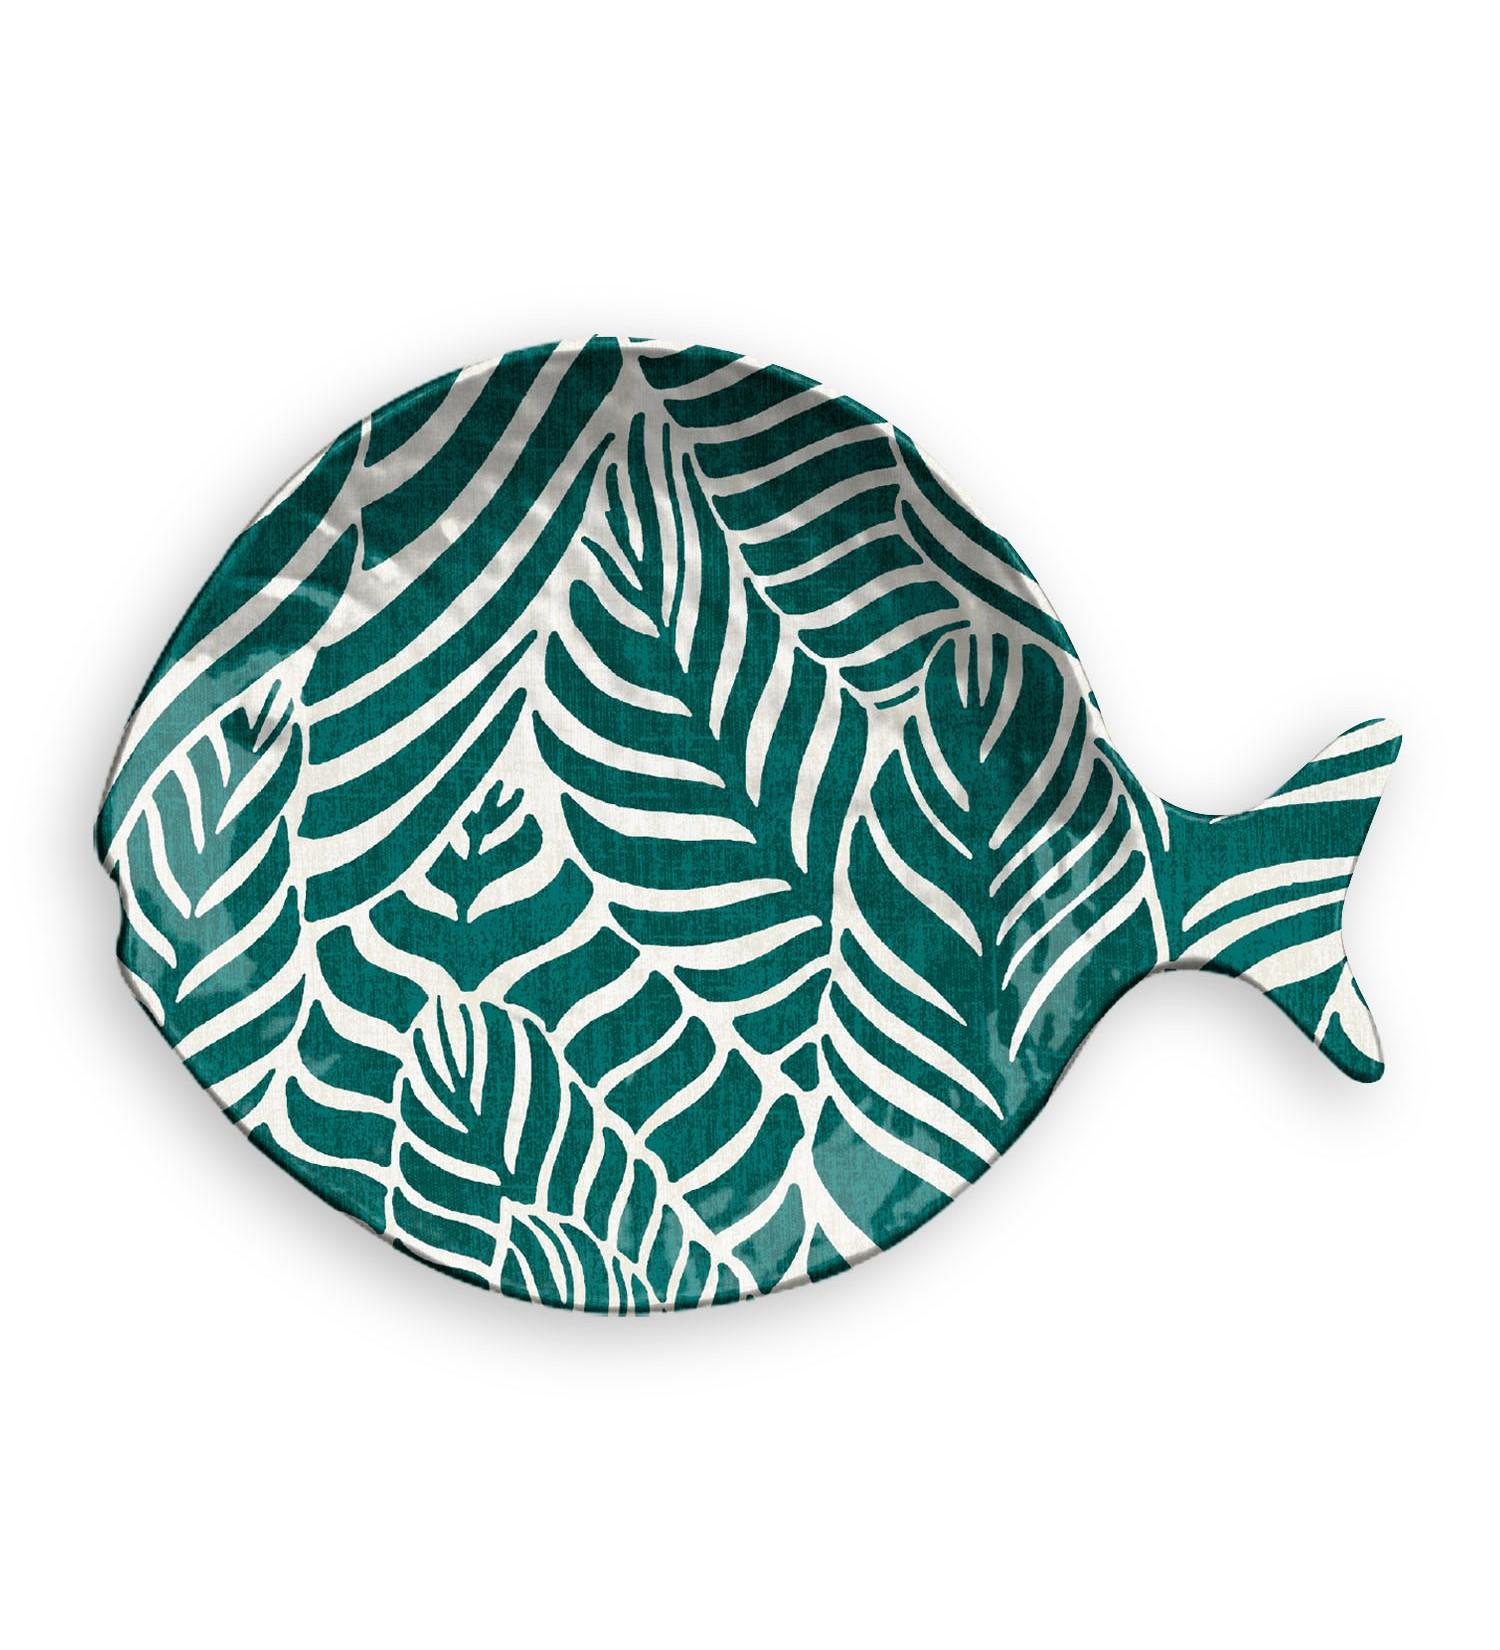 Plato Safari Fish